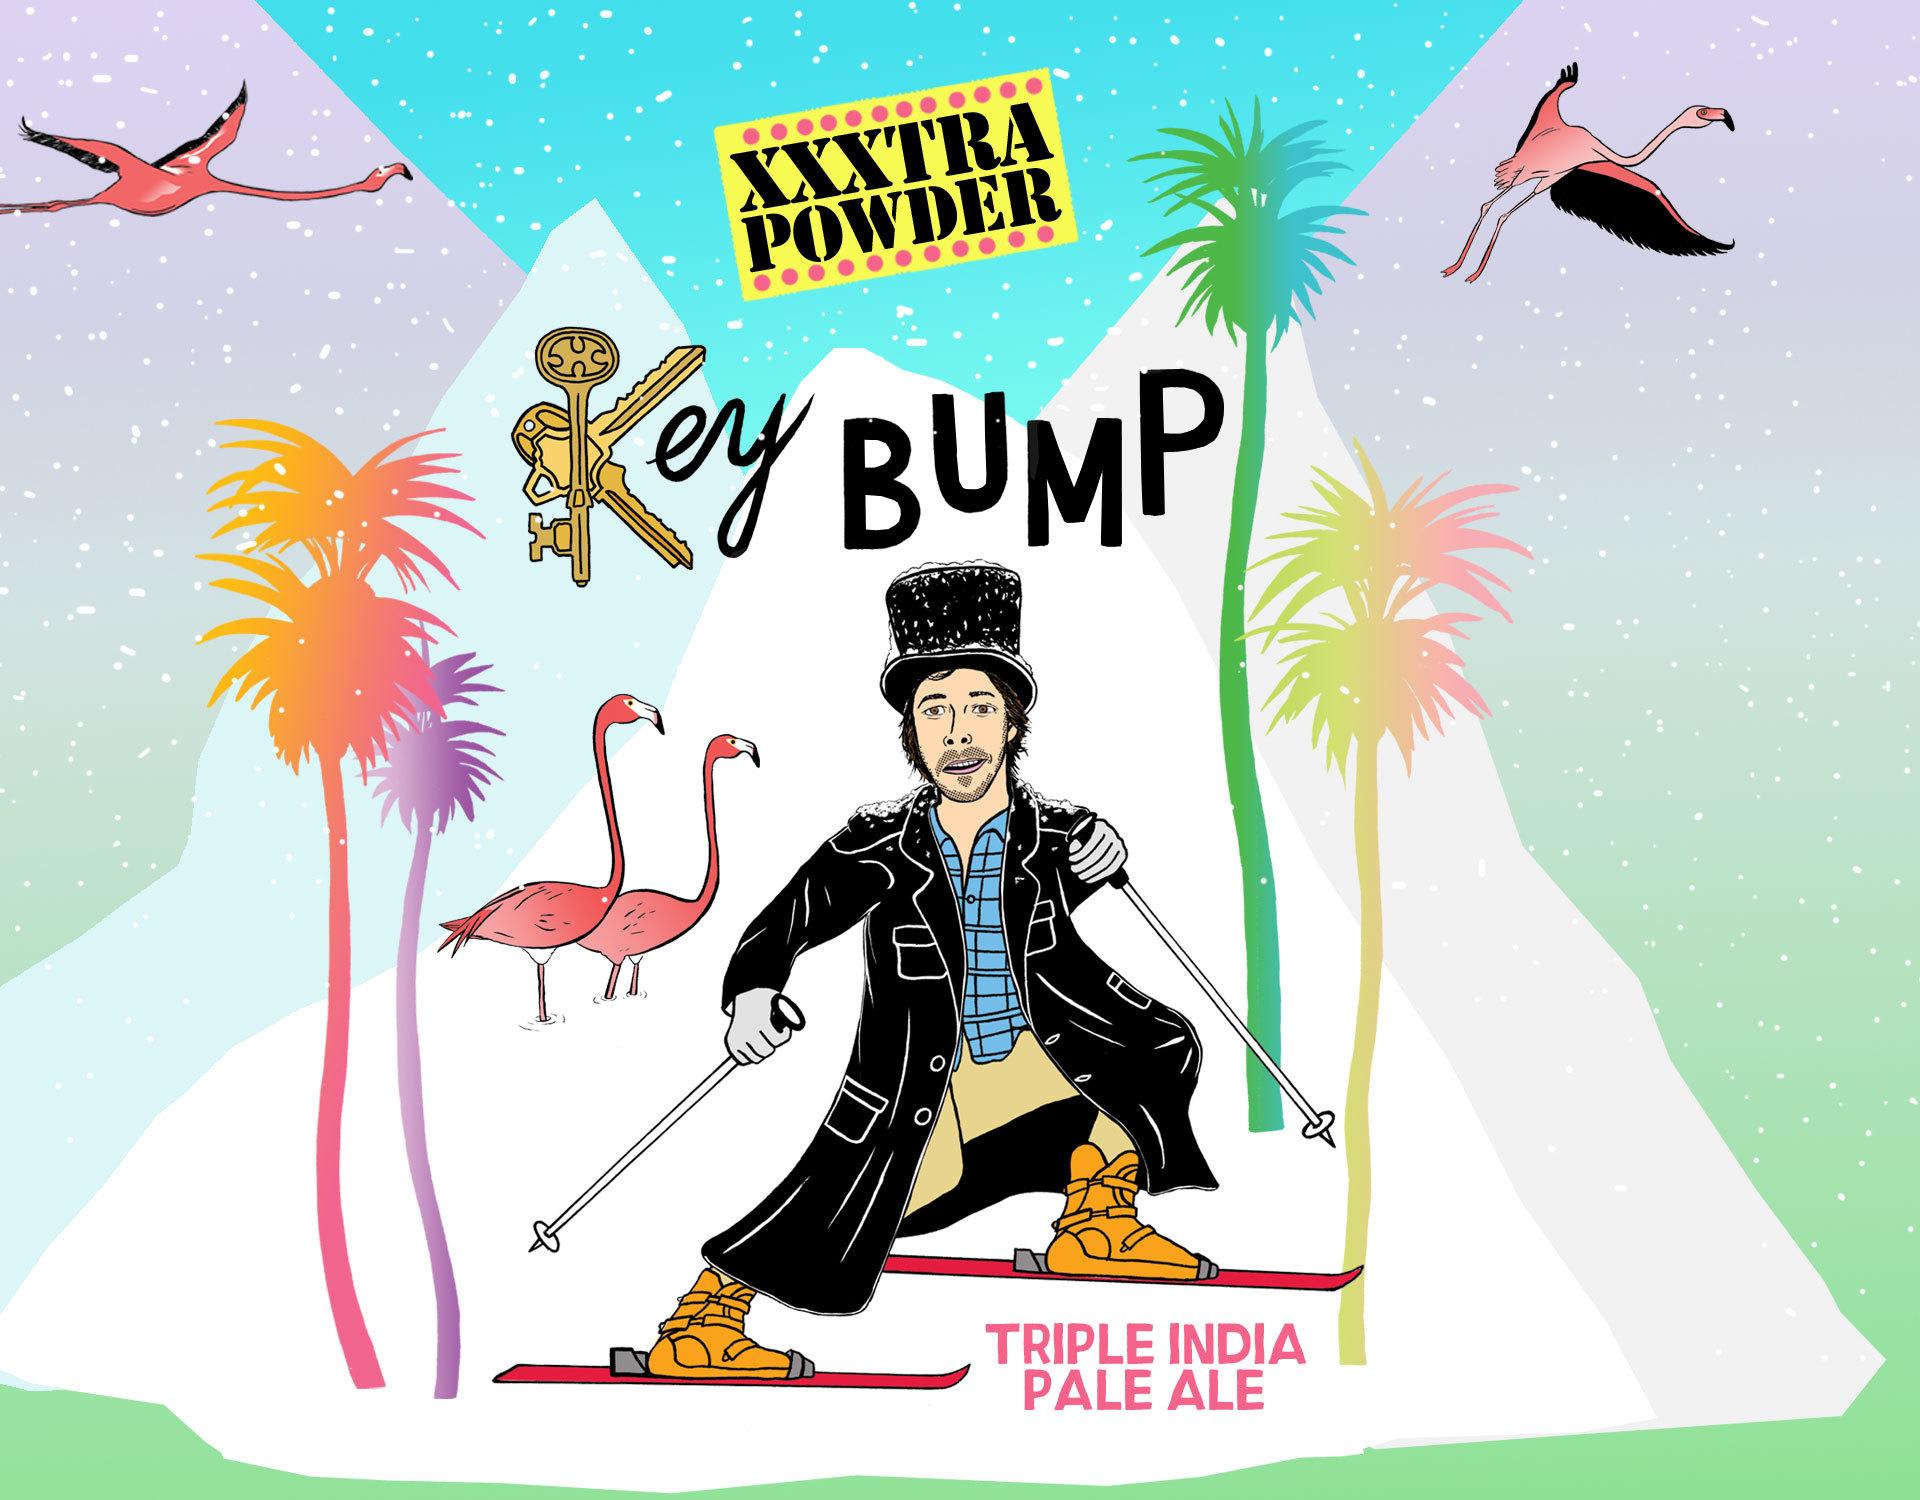 Key Bump XXXtra Powder beer Label Full Size